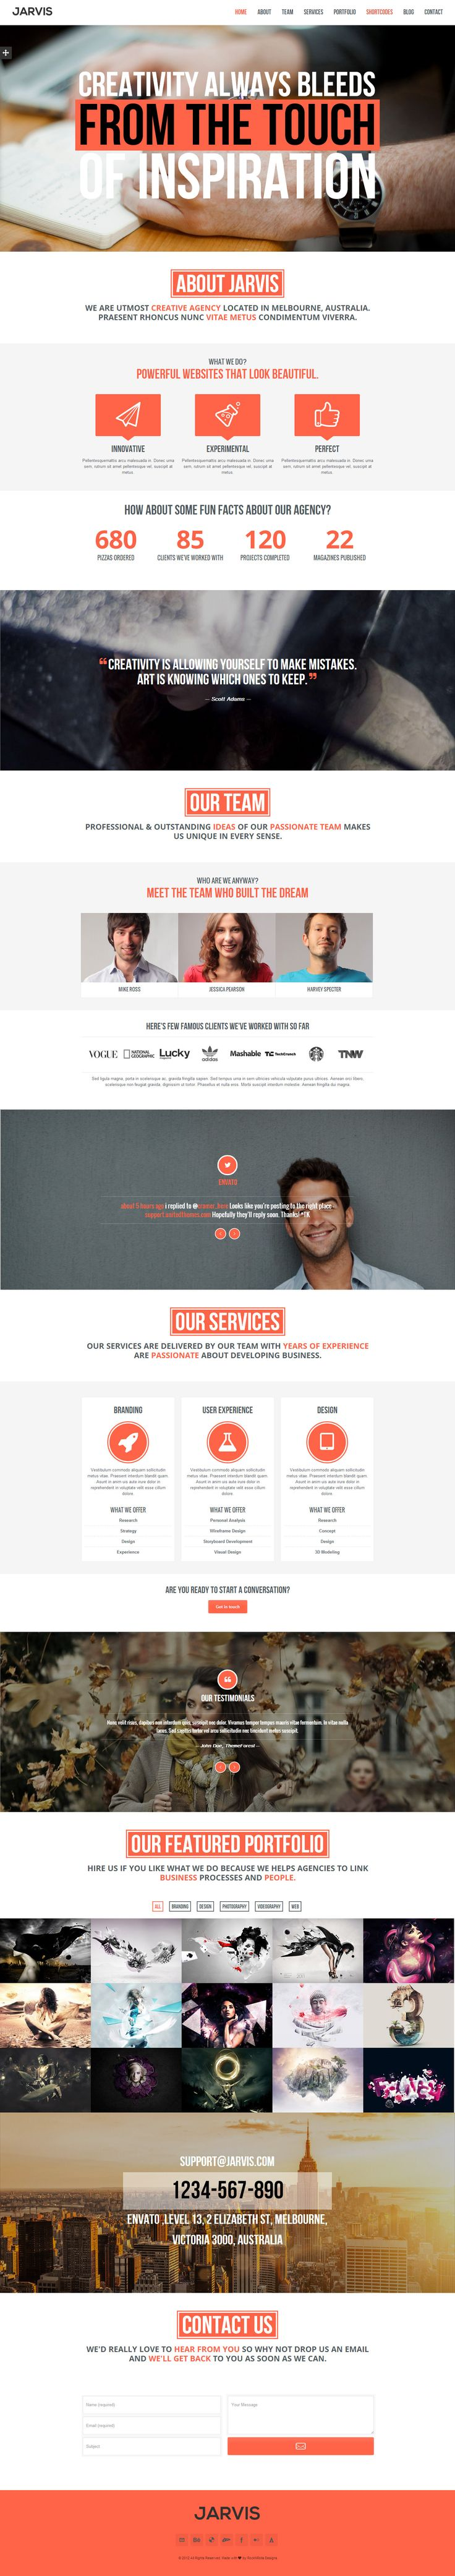 Jarvis - Onepage Parallax WordPress Theme #webdesign #web #design #template #inspiration #portfolio